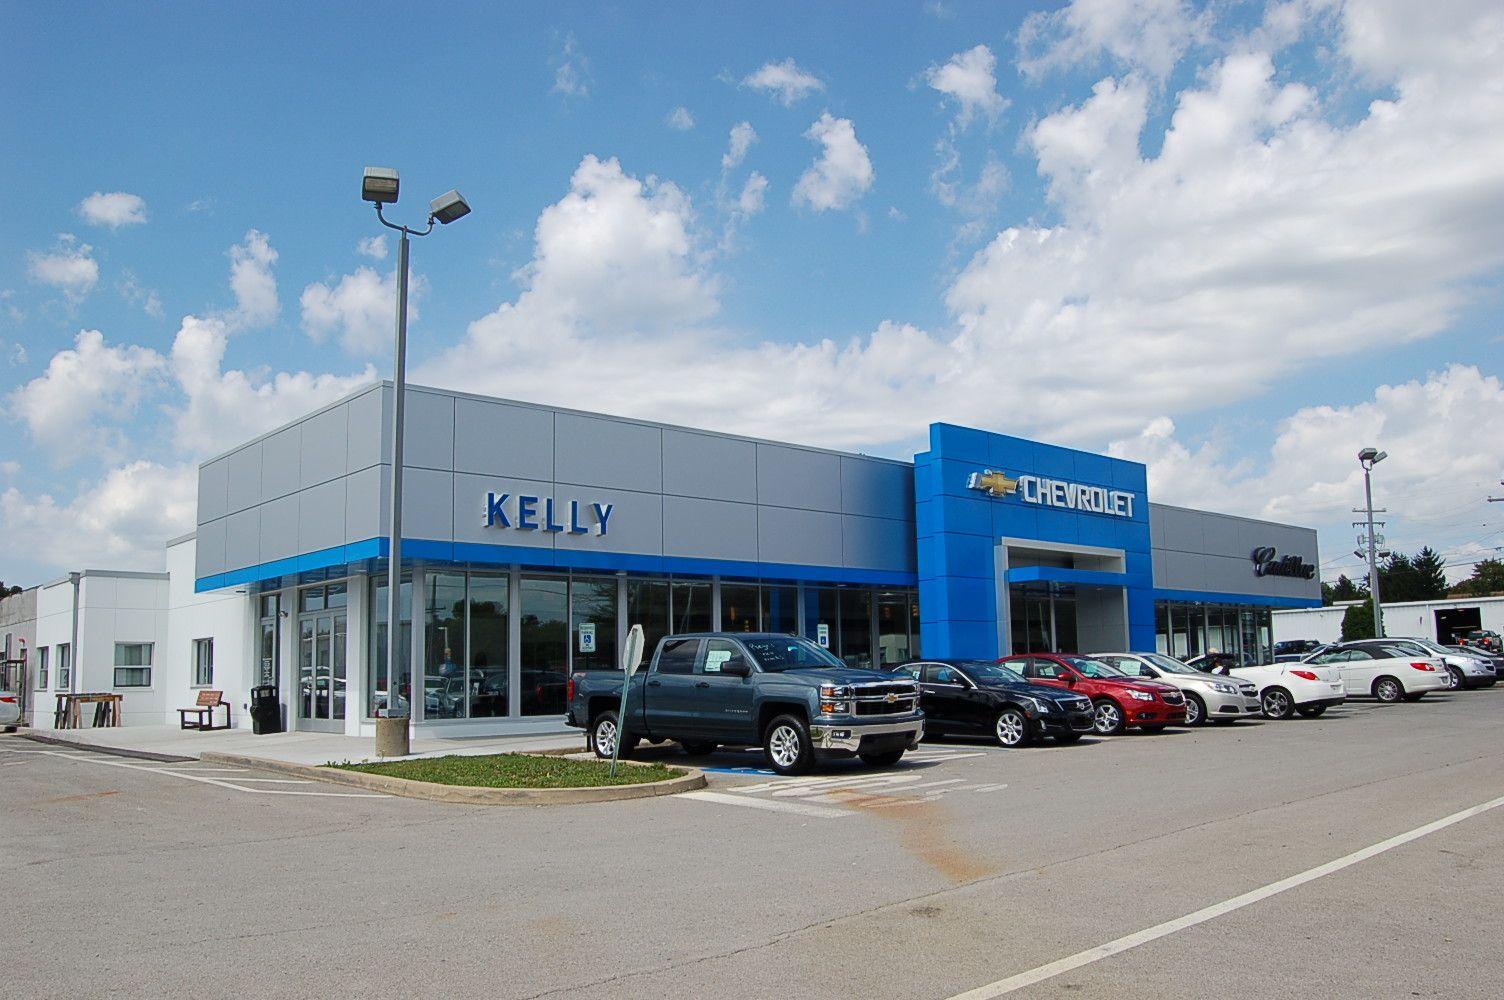 Kelly Chevrolet U0026 Cadillac, Butler, PA